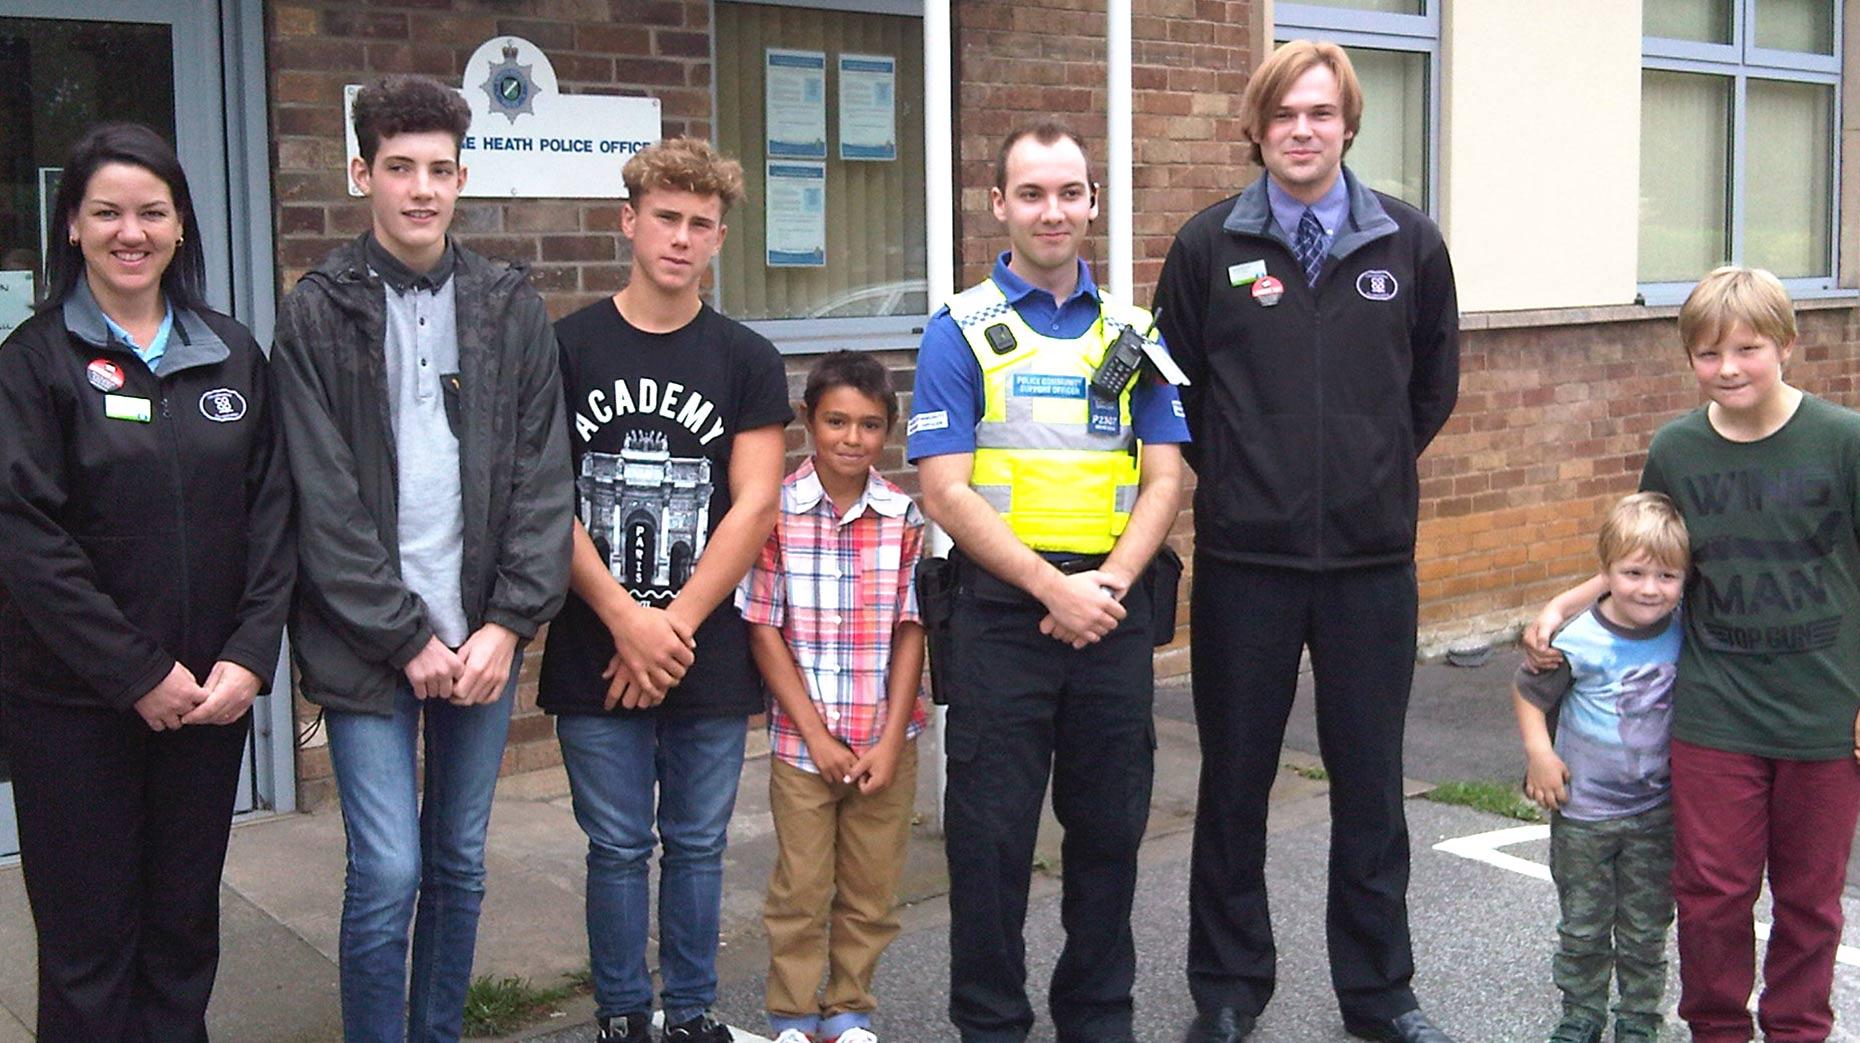 Bracebridge Heath Youths Promote Skatepark Benefits